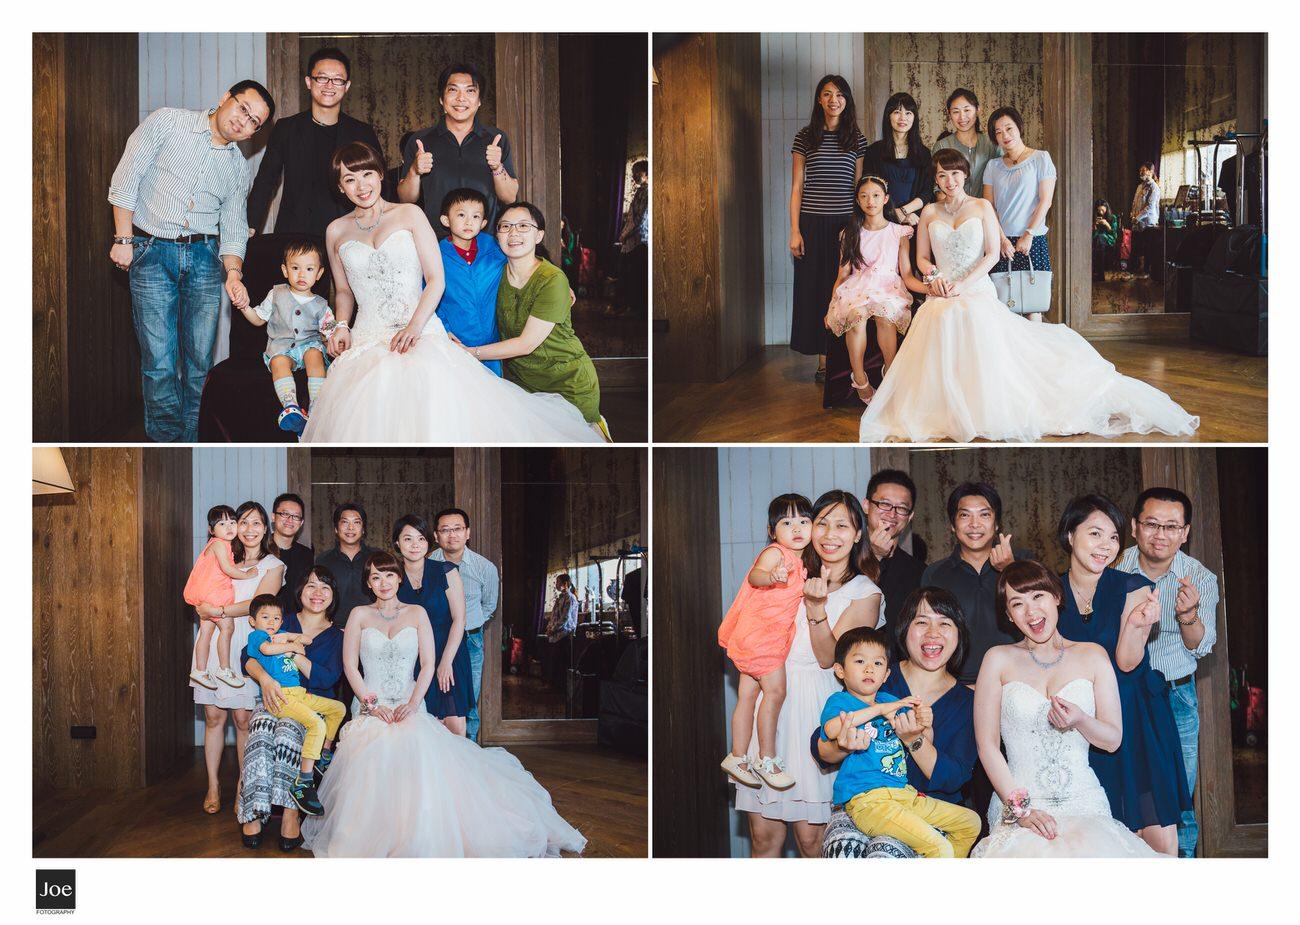 joe-fotography-wedding-photo-palais-de-chine-hotel-017.jpg